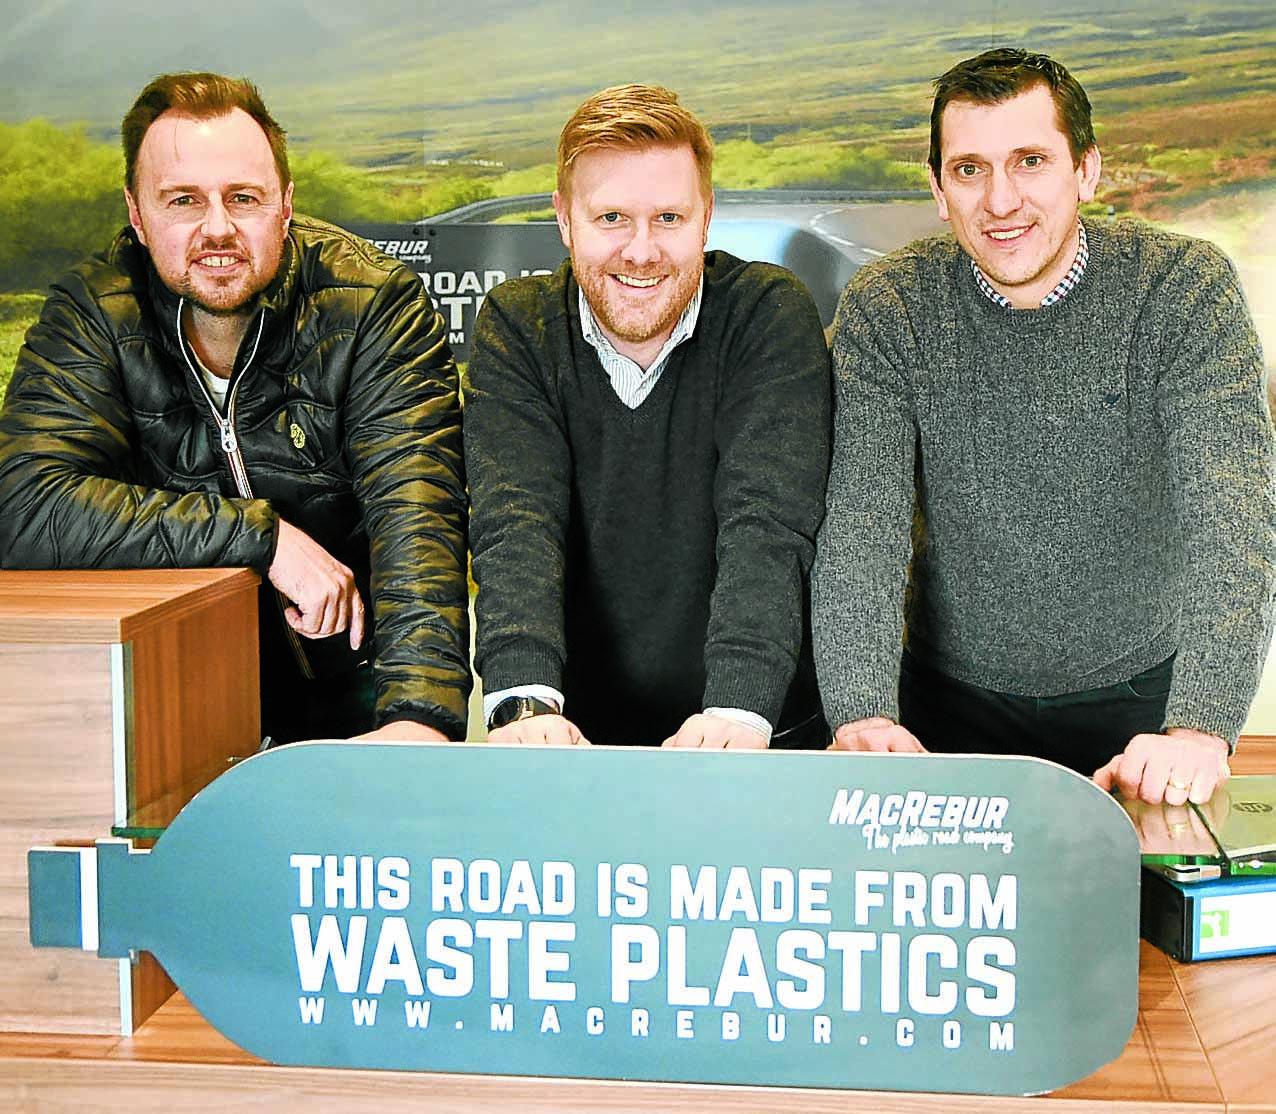 £1.6m boost for plastic roads